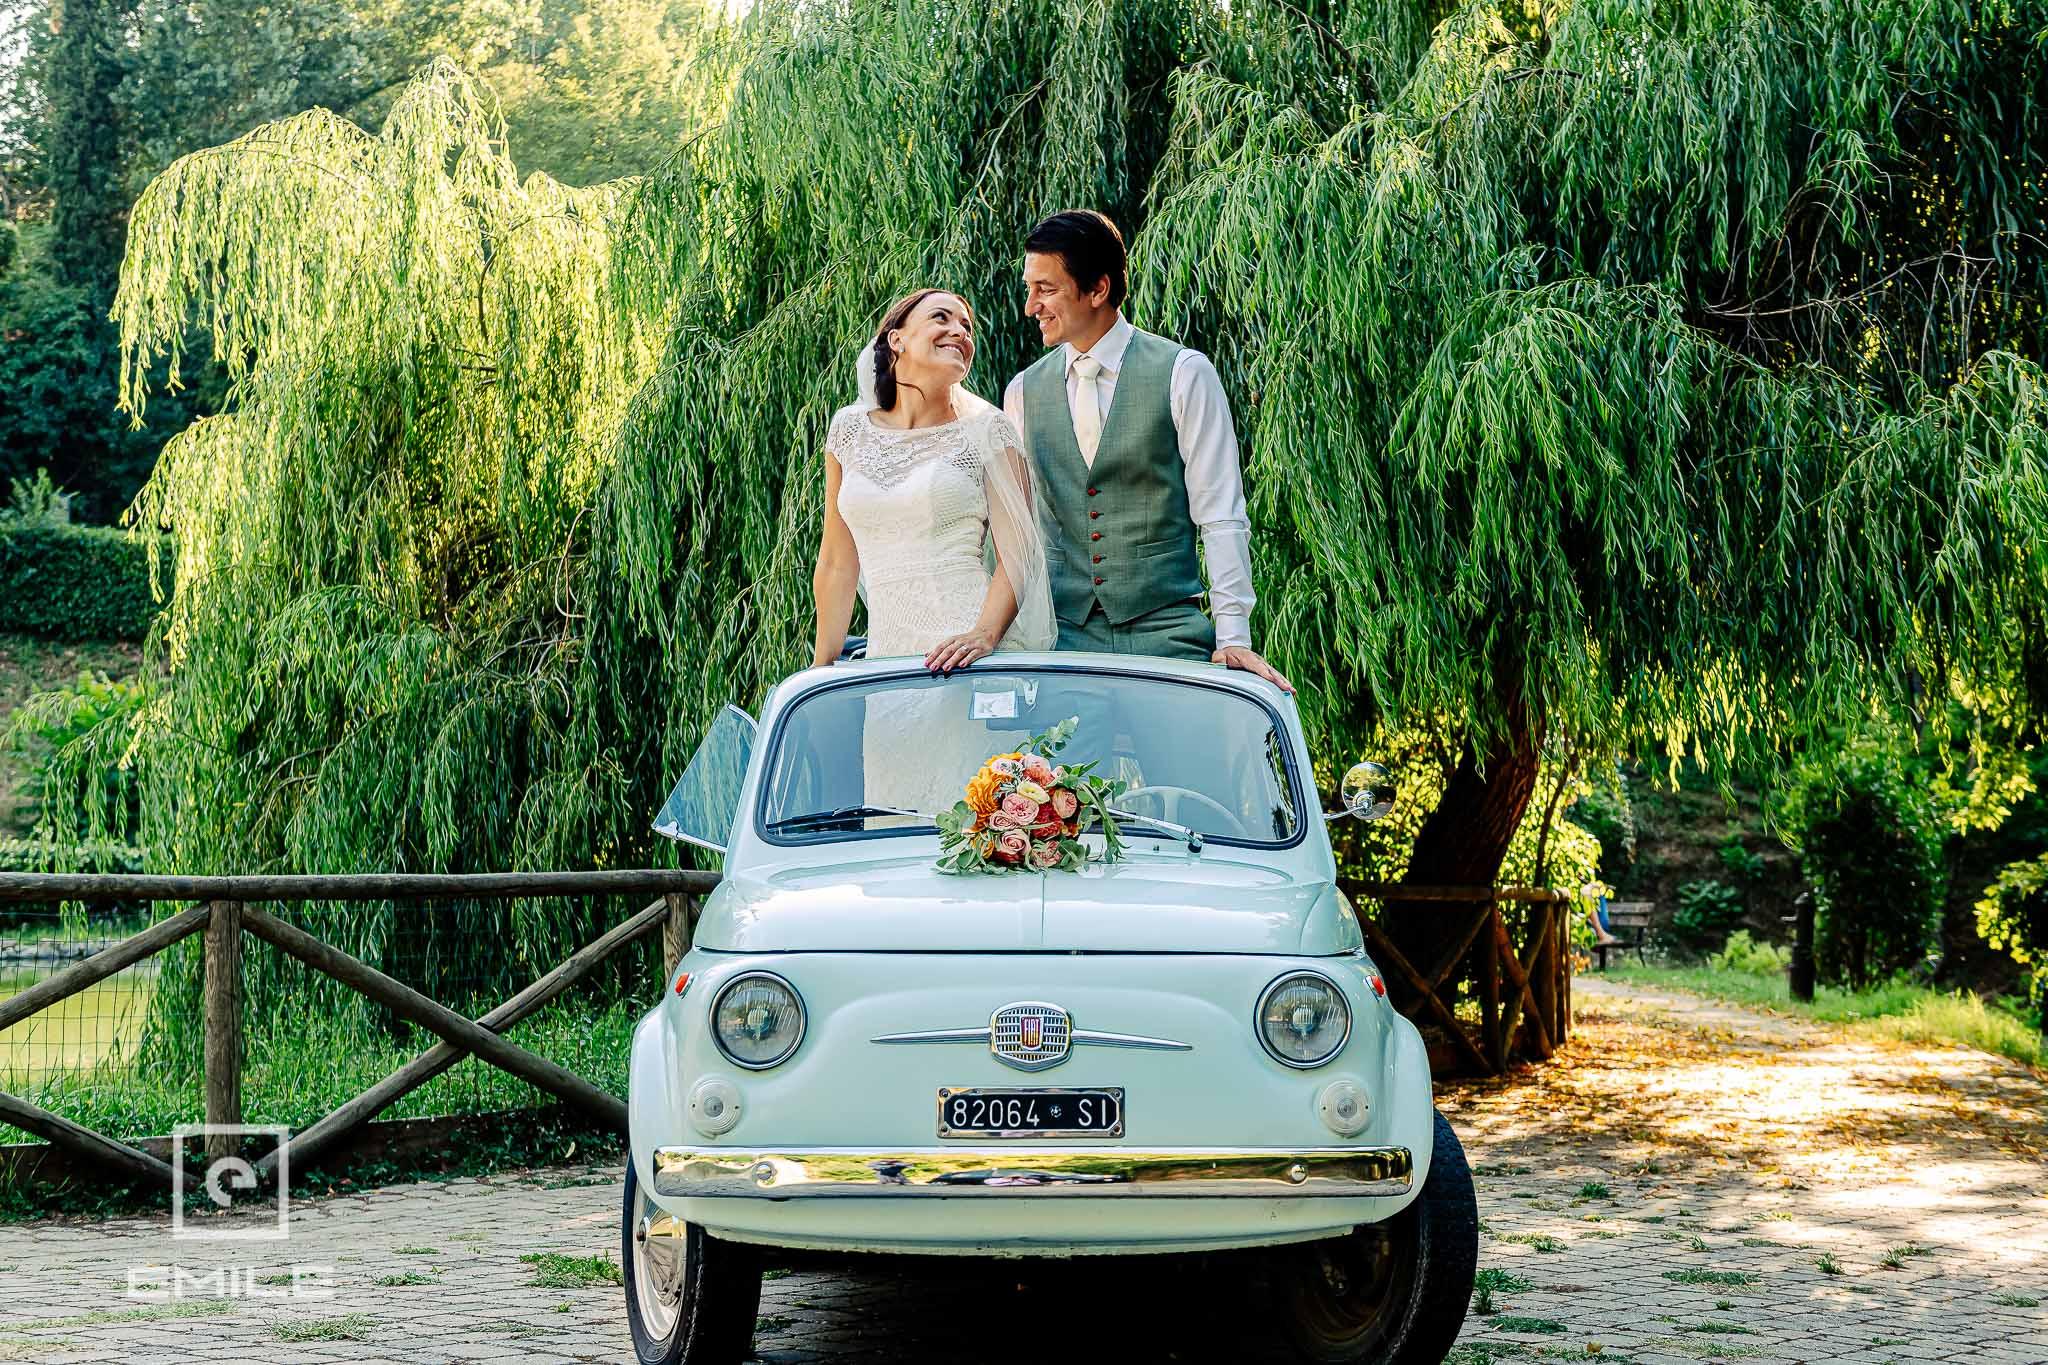 Staand in de FIAT 500 - Destination wedding San Gimignano - Toscane Italie - Iris en Job